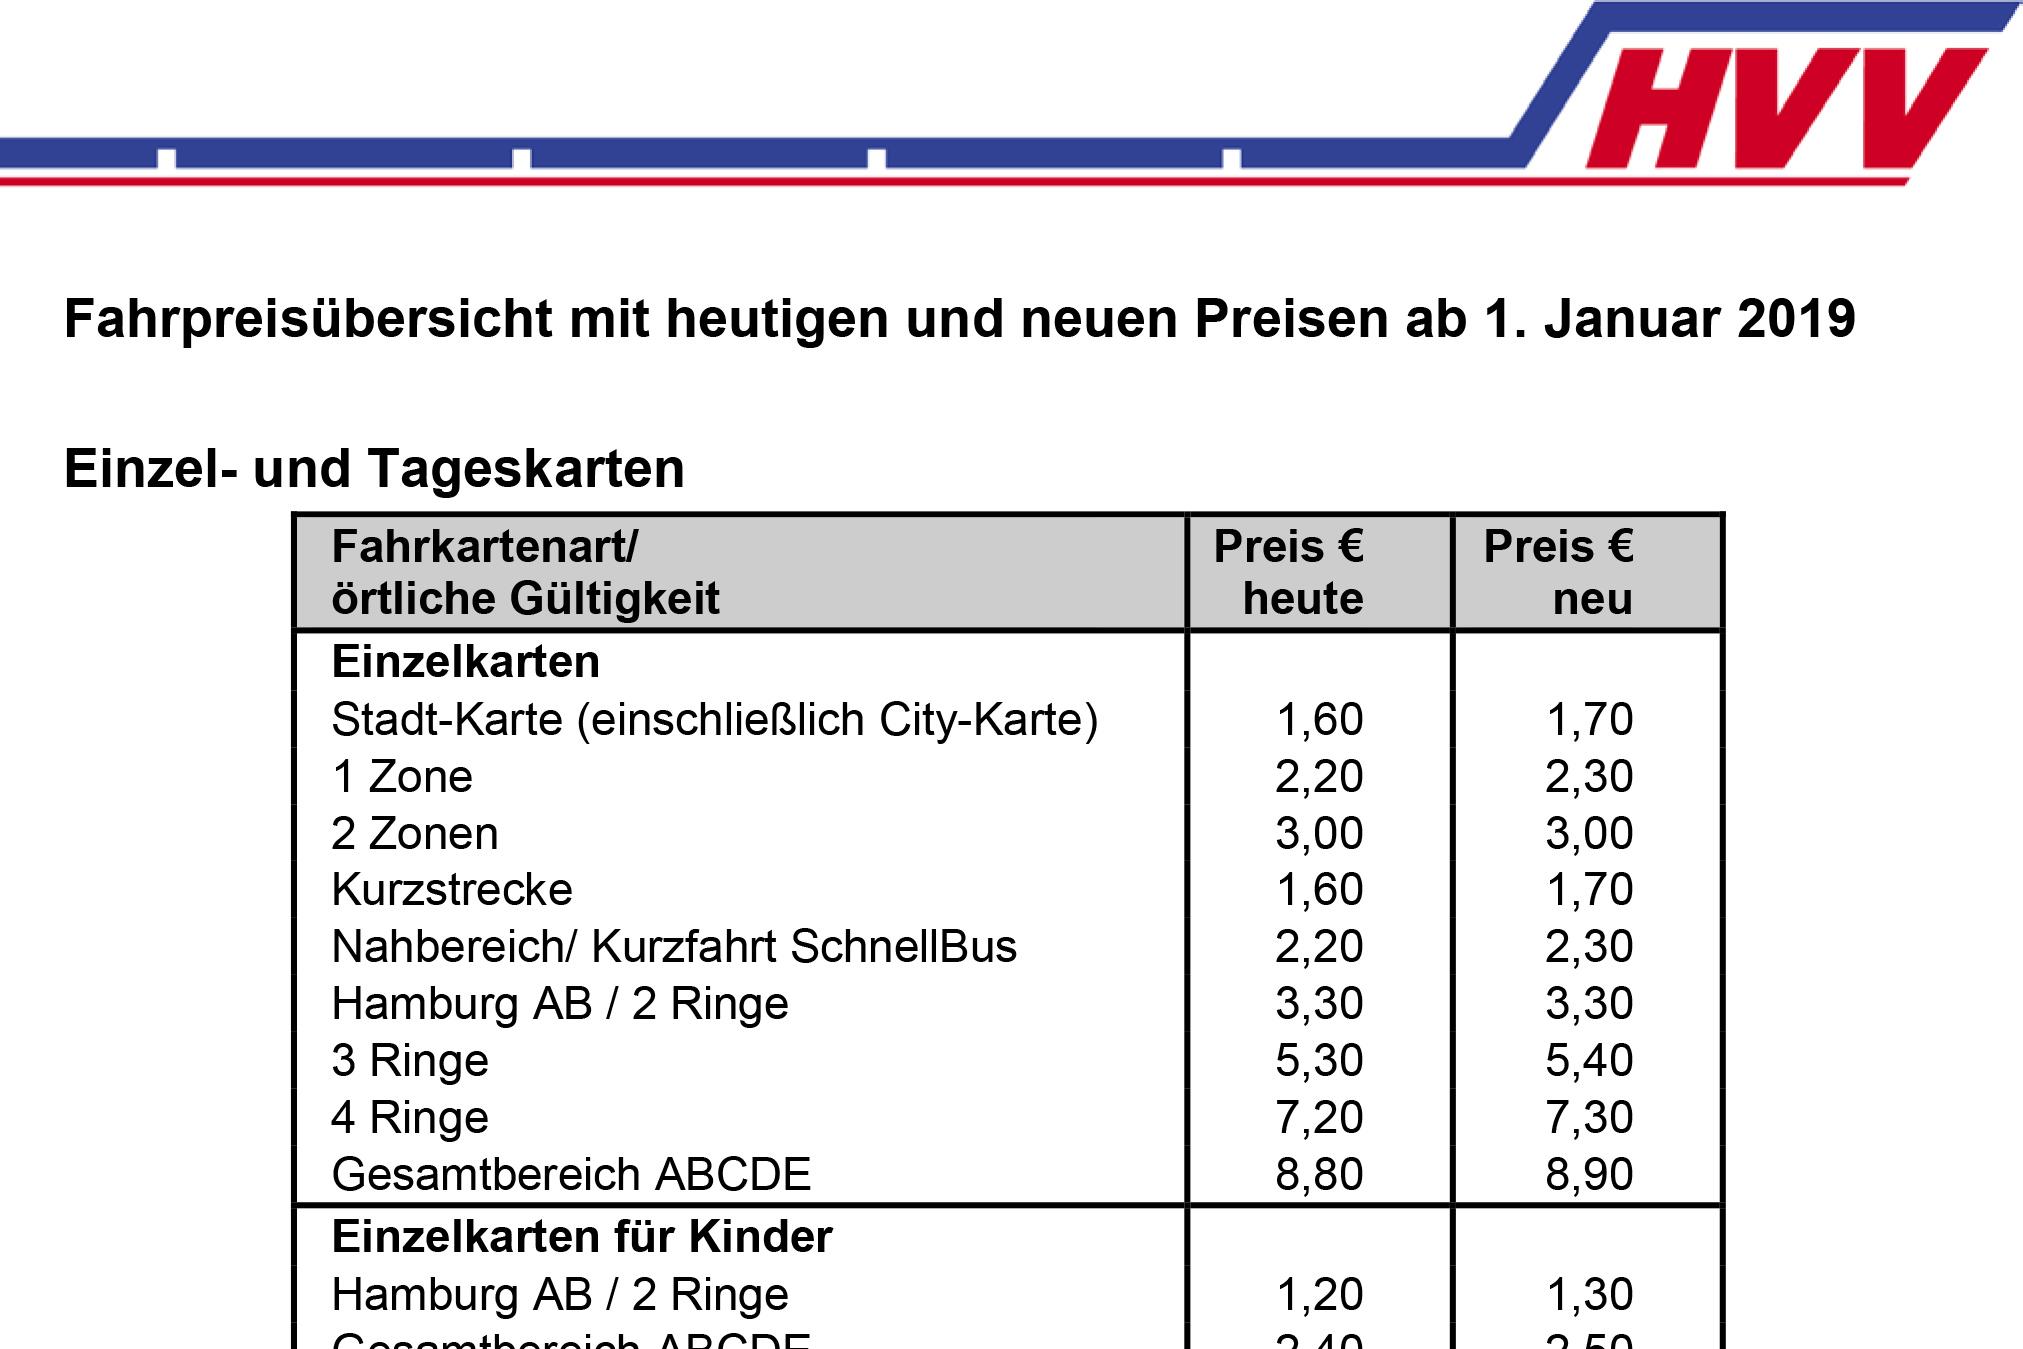 Hvv Karte Ringe.Großkunden Besonders Betroffen Hvv Will Preise Erhöhen Hamburg